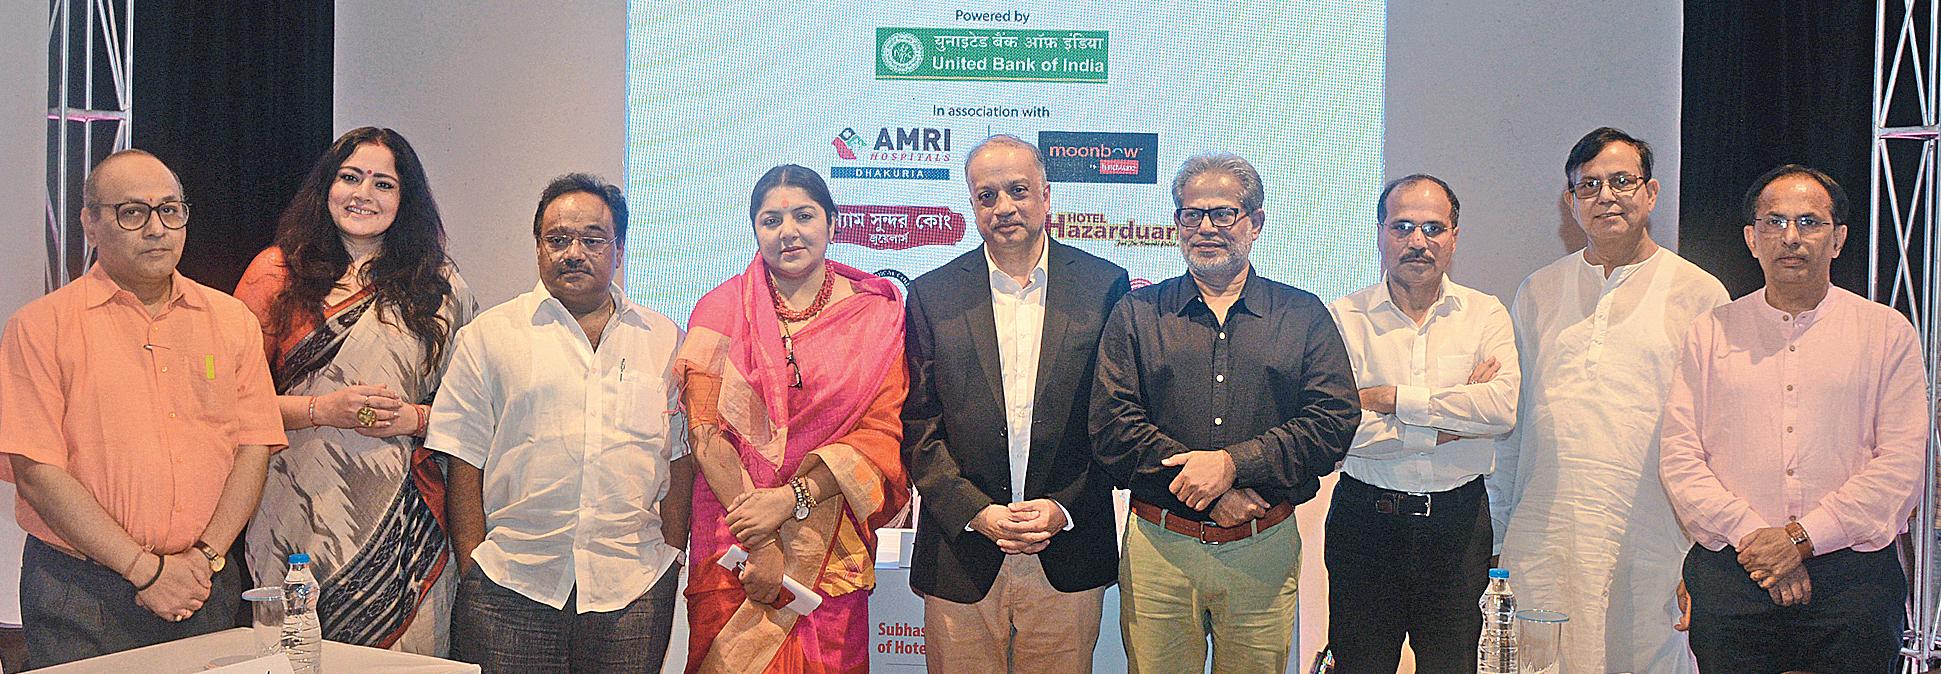 (From left) BJP leader Sarup Prasad Ghosh, Agnimitra Paul, former BJP MLA and party spokesperson Samik Bhattacharya, BJP MP Locket Chatterjee, cardiac surgeon and moderator of the debate Kunal Sarkar, Subodh Sarkar, Adhir Ranjan Chowdhury, Mohammad Salim, and Abhijit Chowdhury at Desh Bitarko 2019.